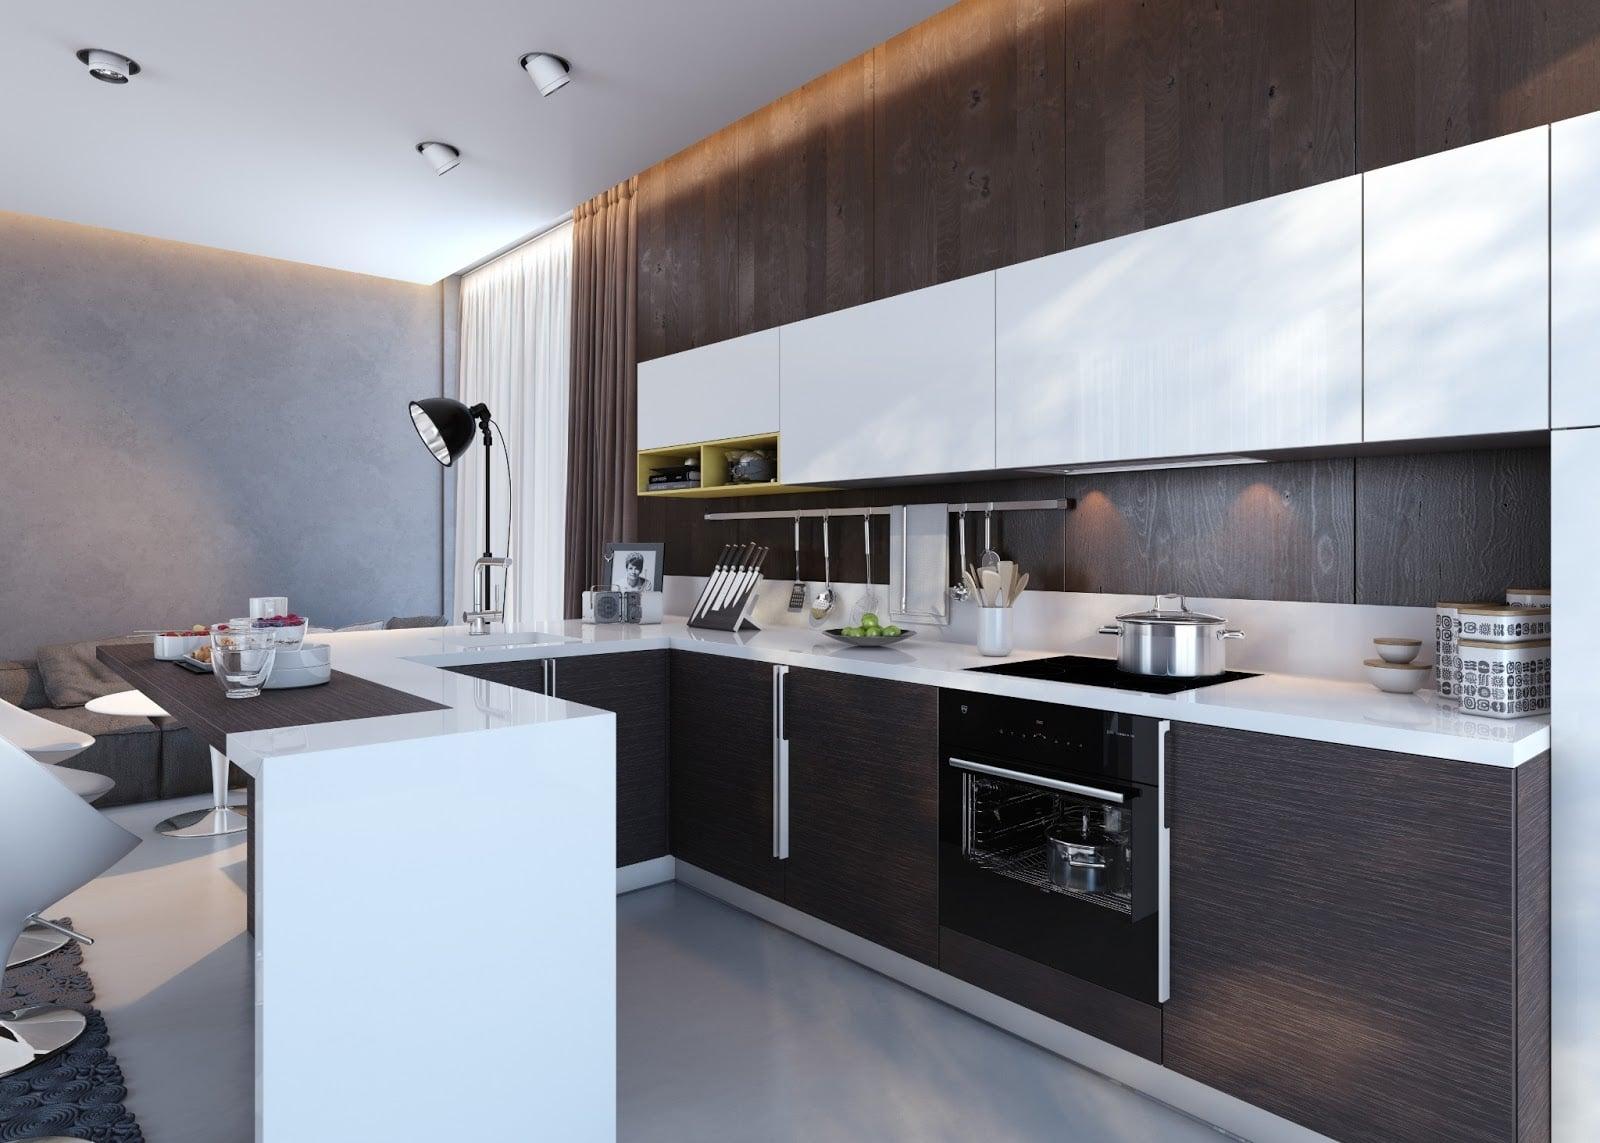 cocina de lujo moderna mediana